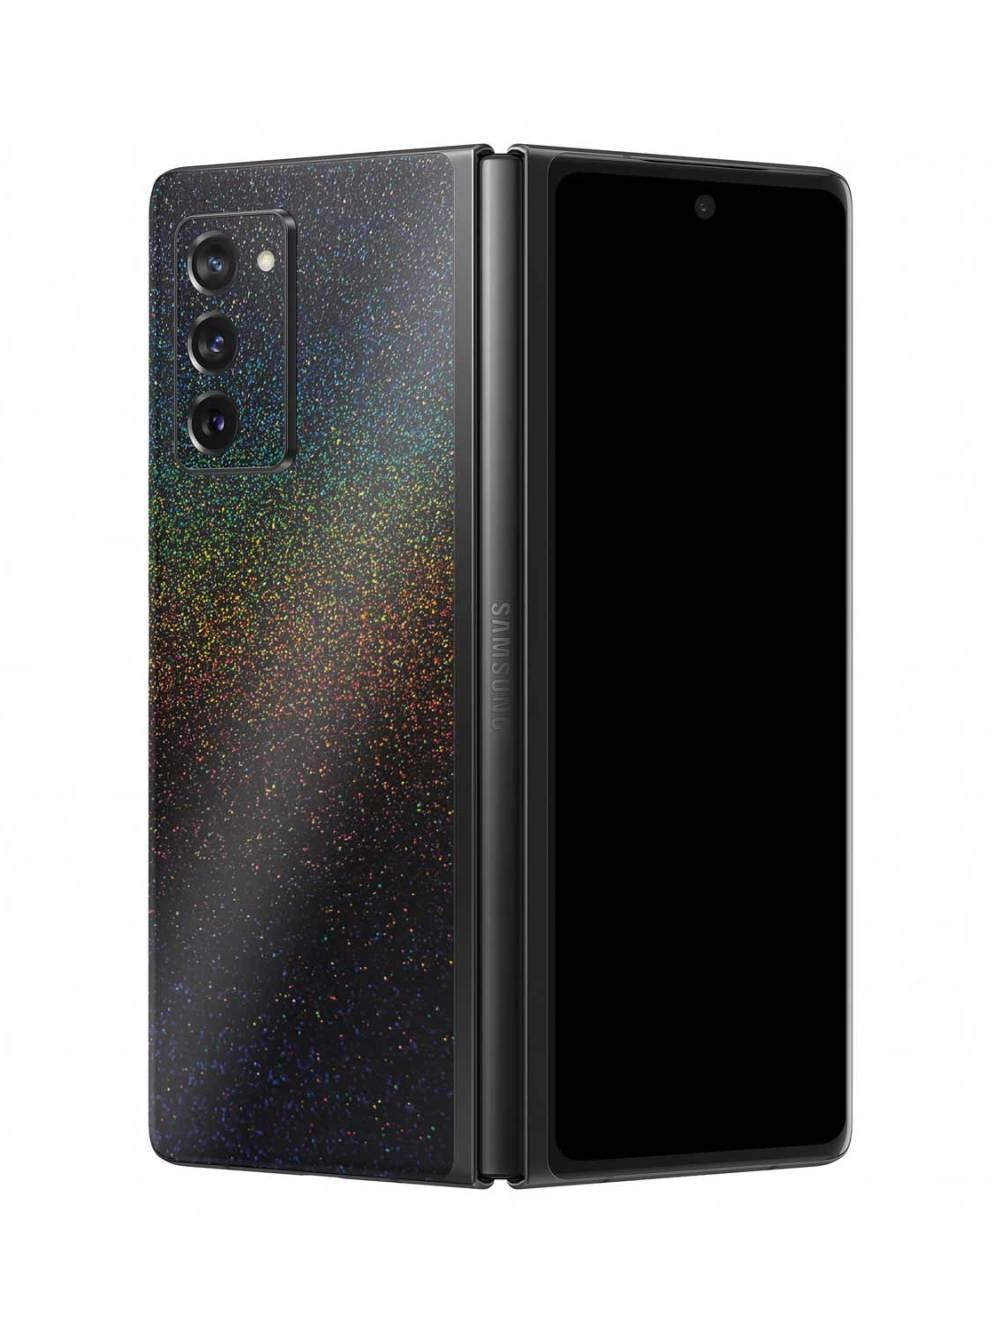 Gloss Cosmic Morpheus Black Vinyl Skin Wrap for Samsung Galaxy Z Fold2 5G